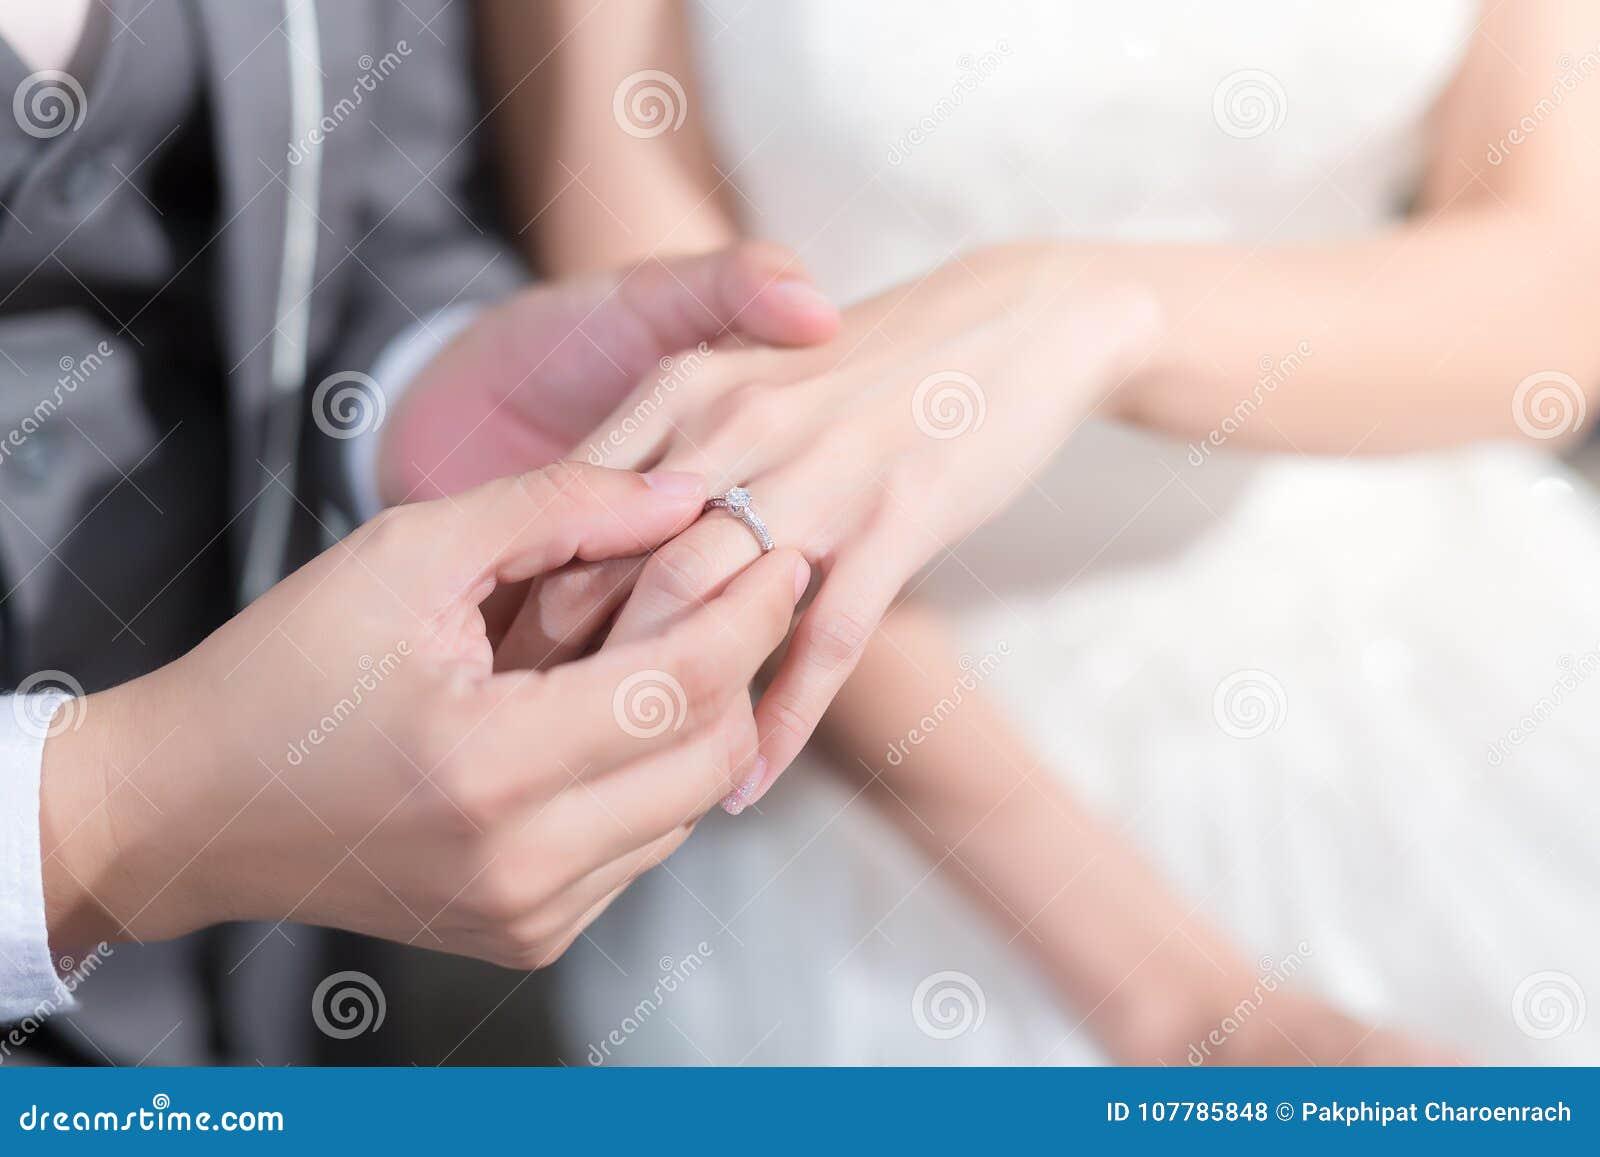 Arm, Attentive, Betrothed, Blonde, Bouquet, Boutonniere, Bride ...